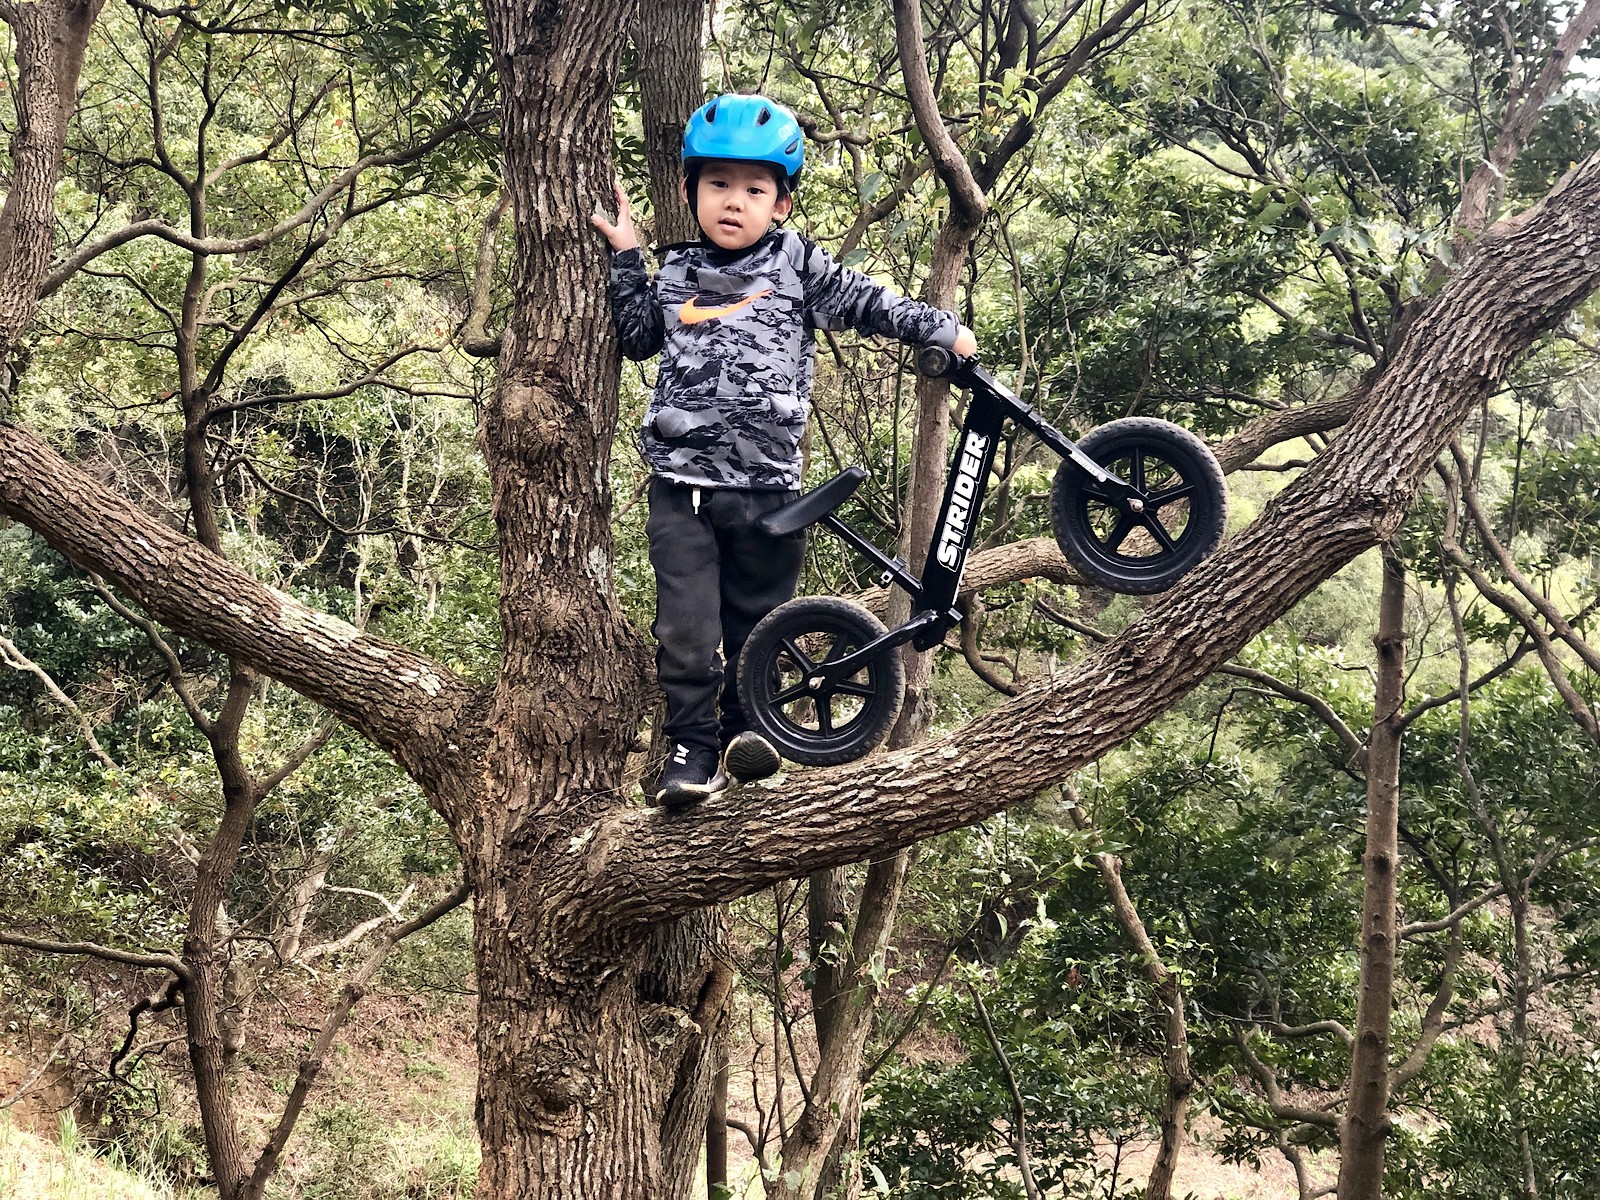 0FFE31D8-AEBC-443F-BC70-D6BF34B24003 - Rickychang - Mountain Biking Pictures - Vital MTB